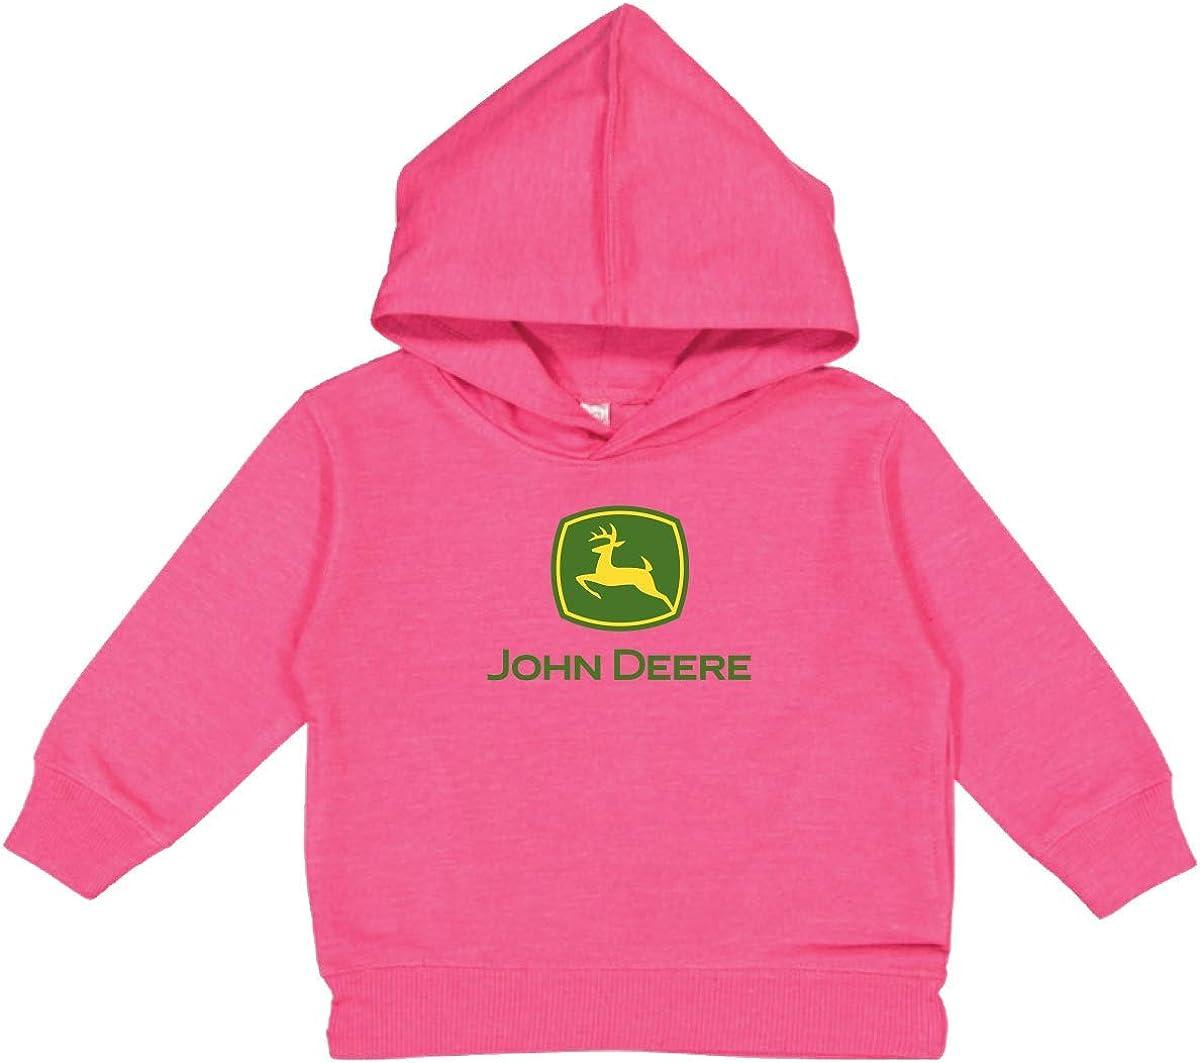 John Deere Youth Girl Hooded Sweatshirt-Hot Pink